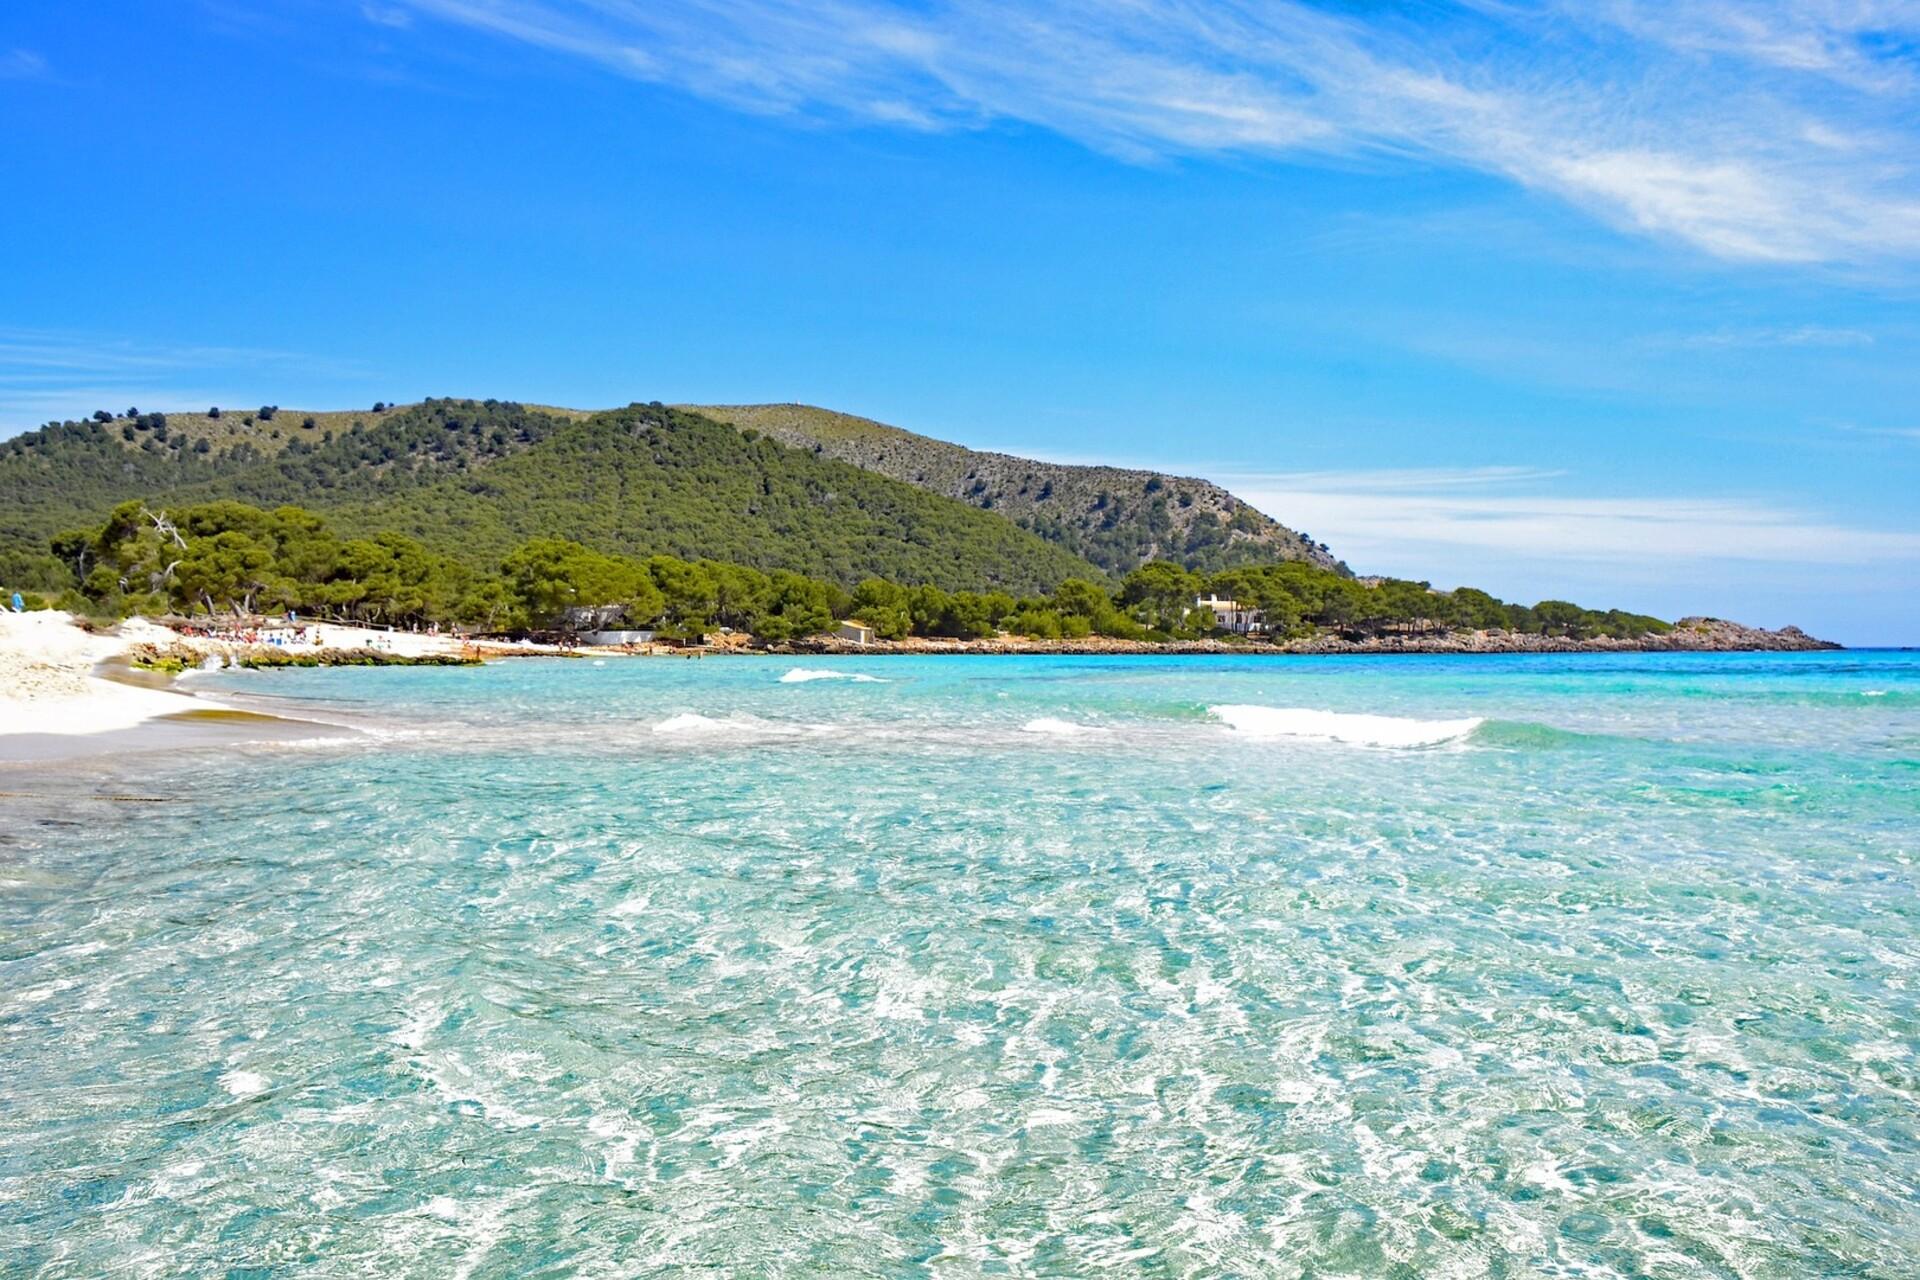 Cala Agulla Beach, Majorca